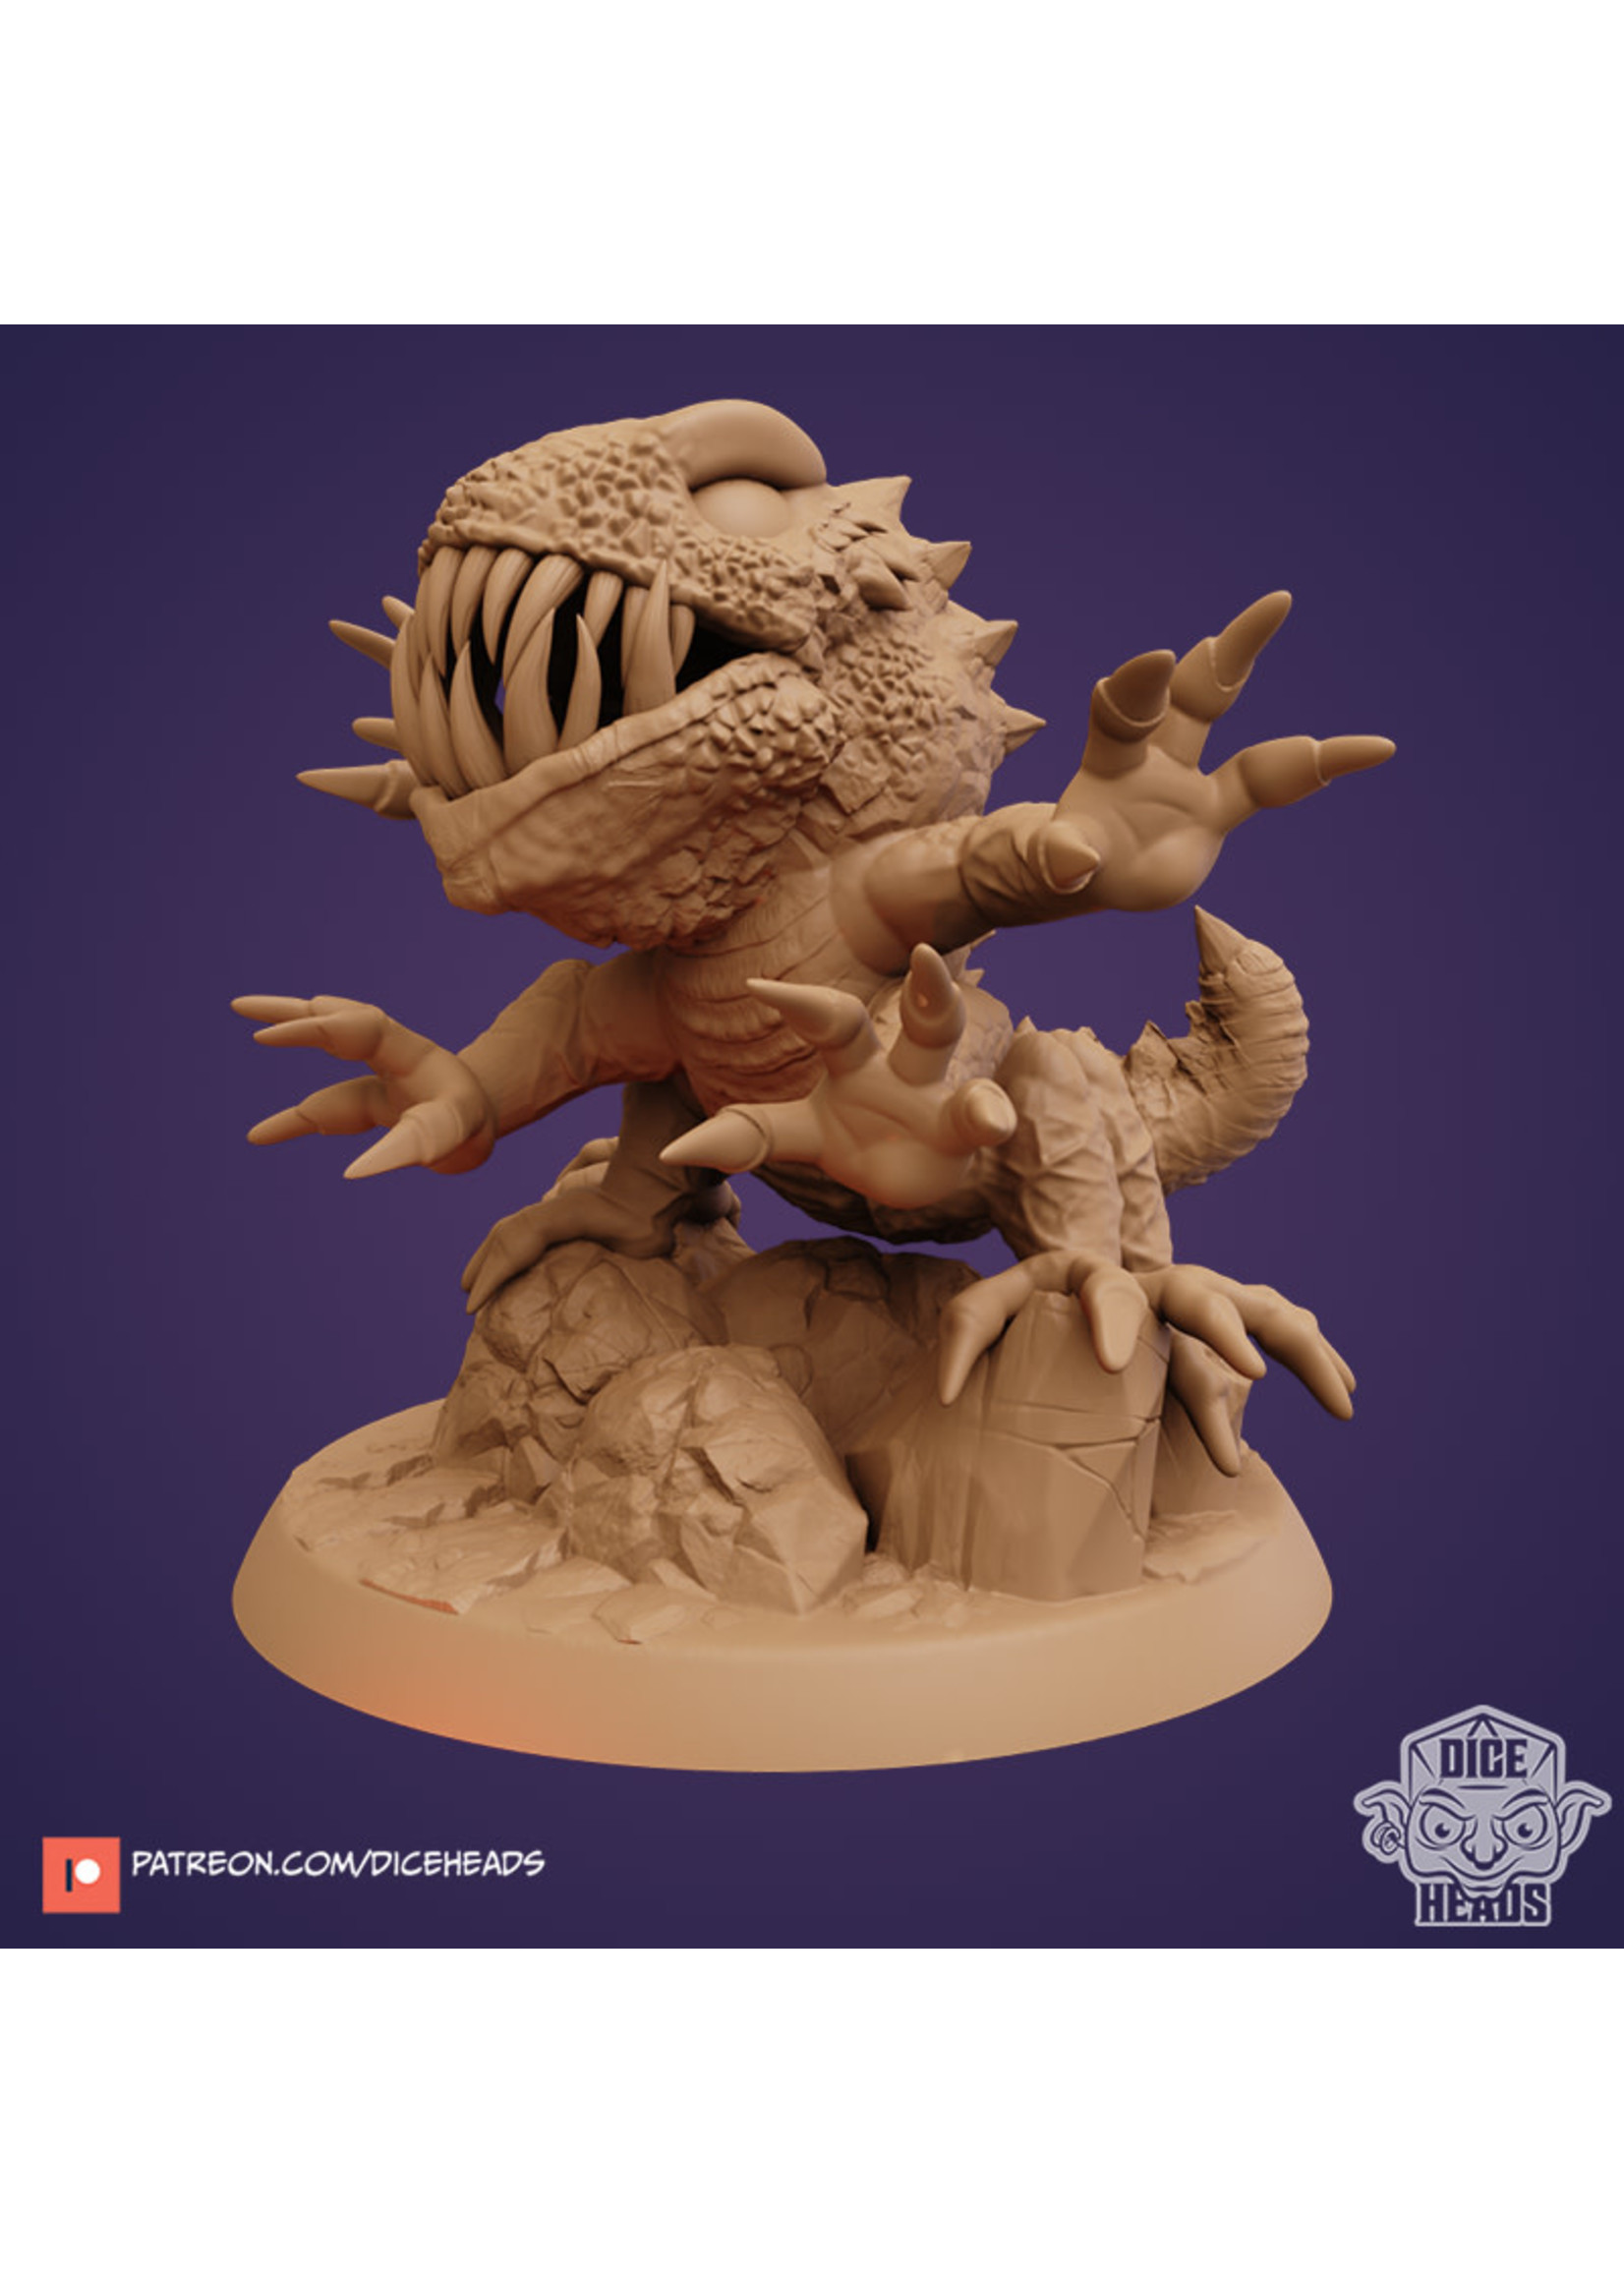 3D Printed Miniature - Bassilisk - Dungeons & Dragons - Zoontalis KS